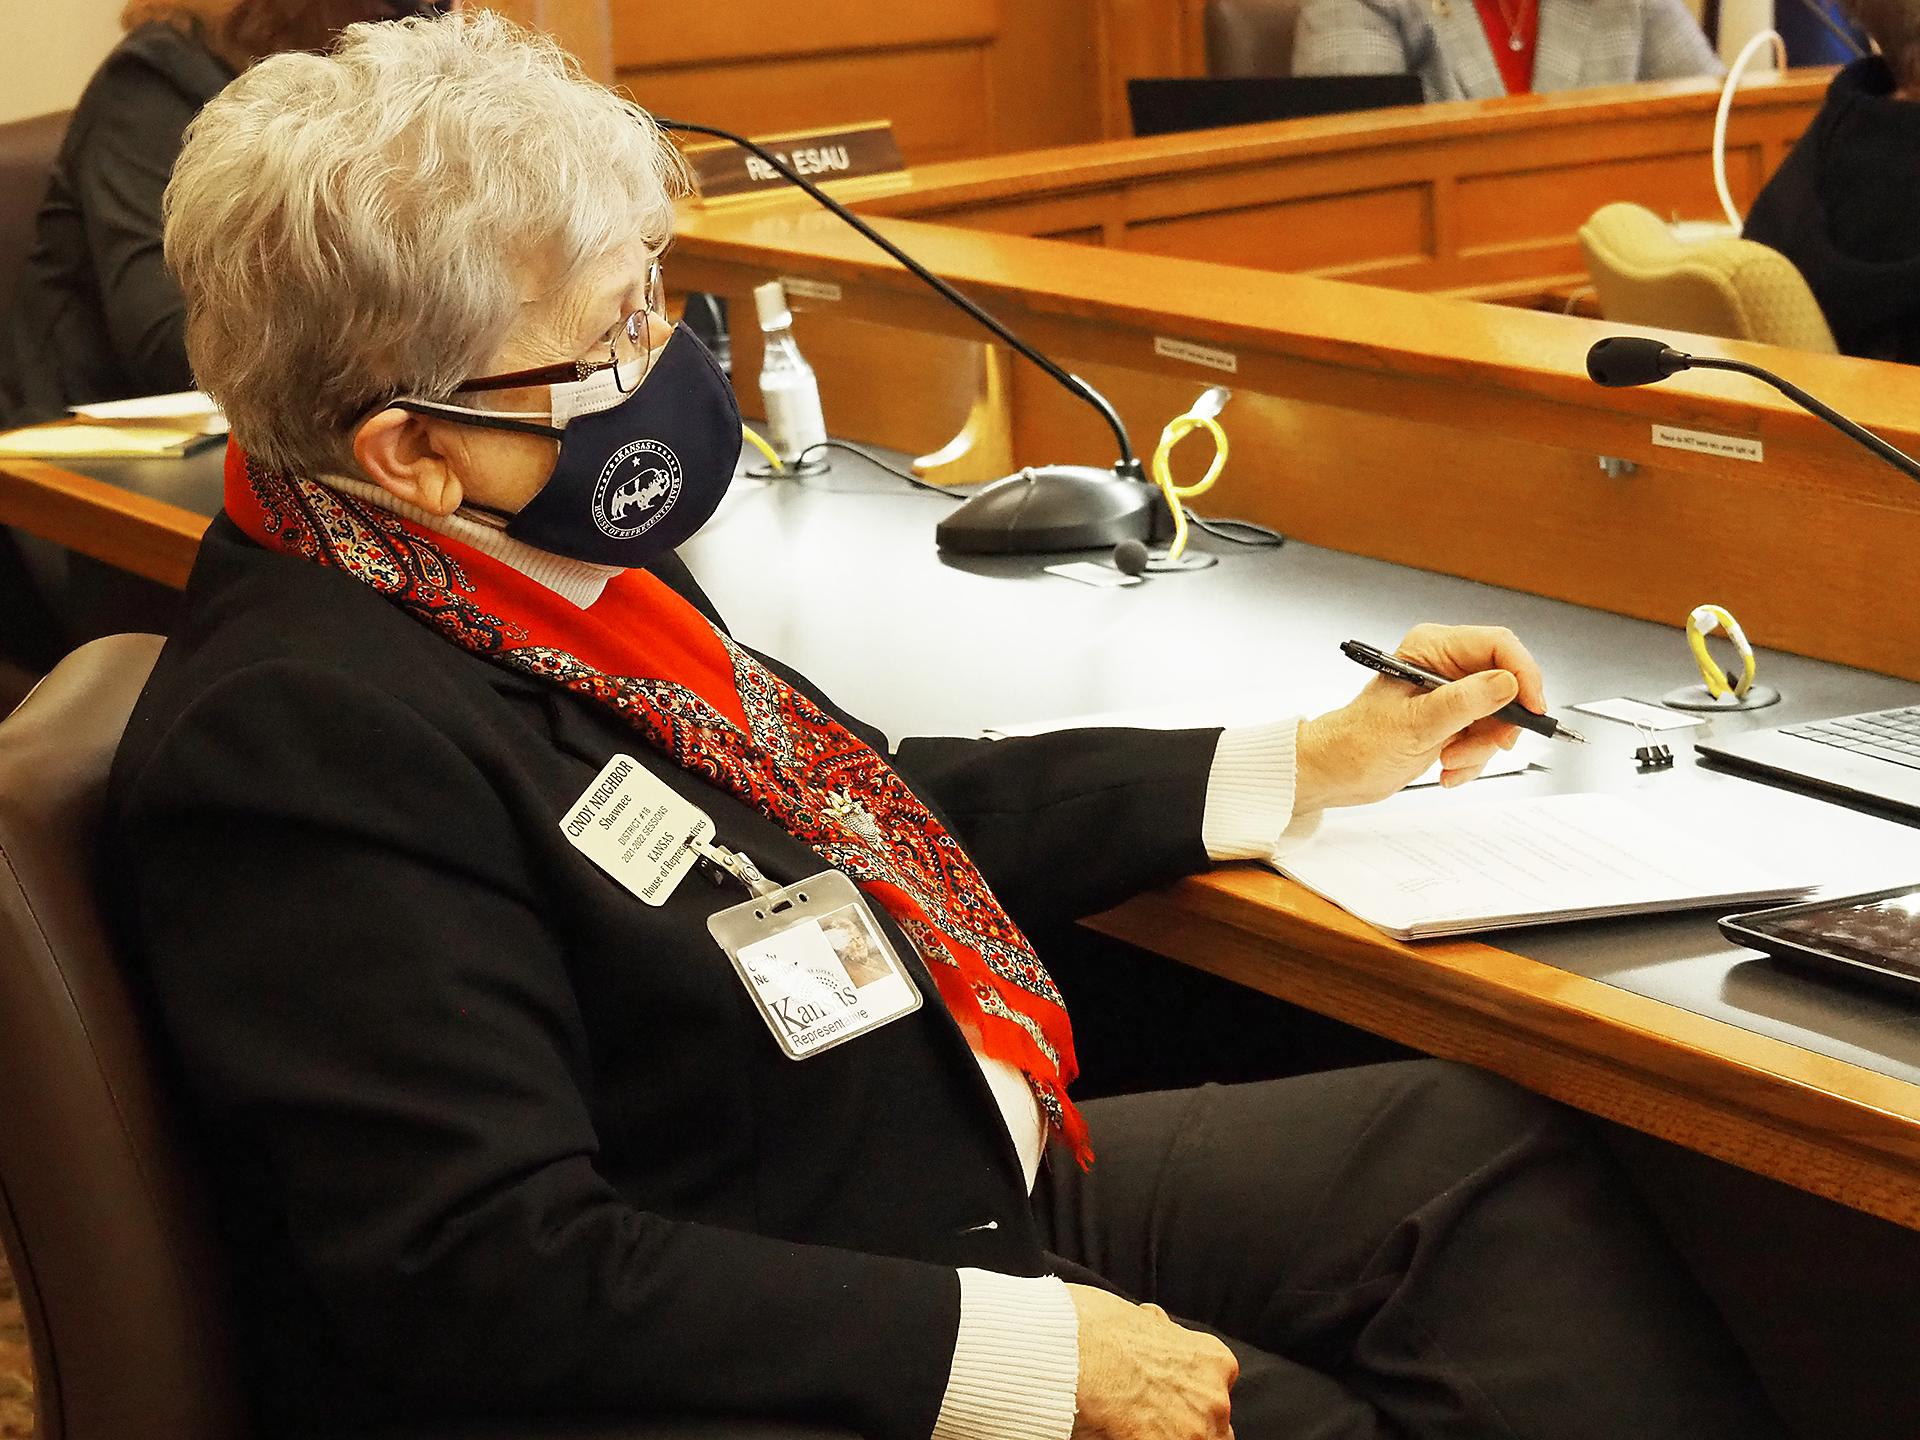 Short-term health insurance expansion passed by Kansas Legislature raises bipartisan concerns